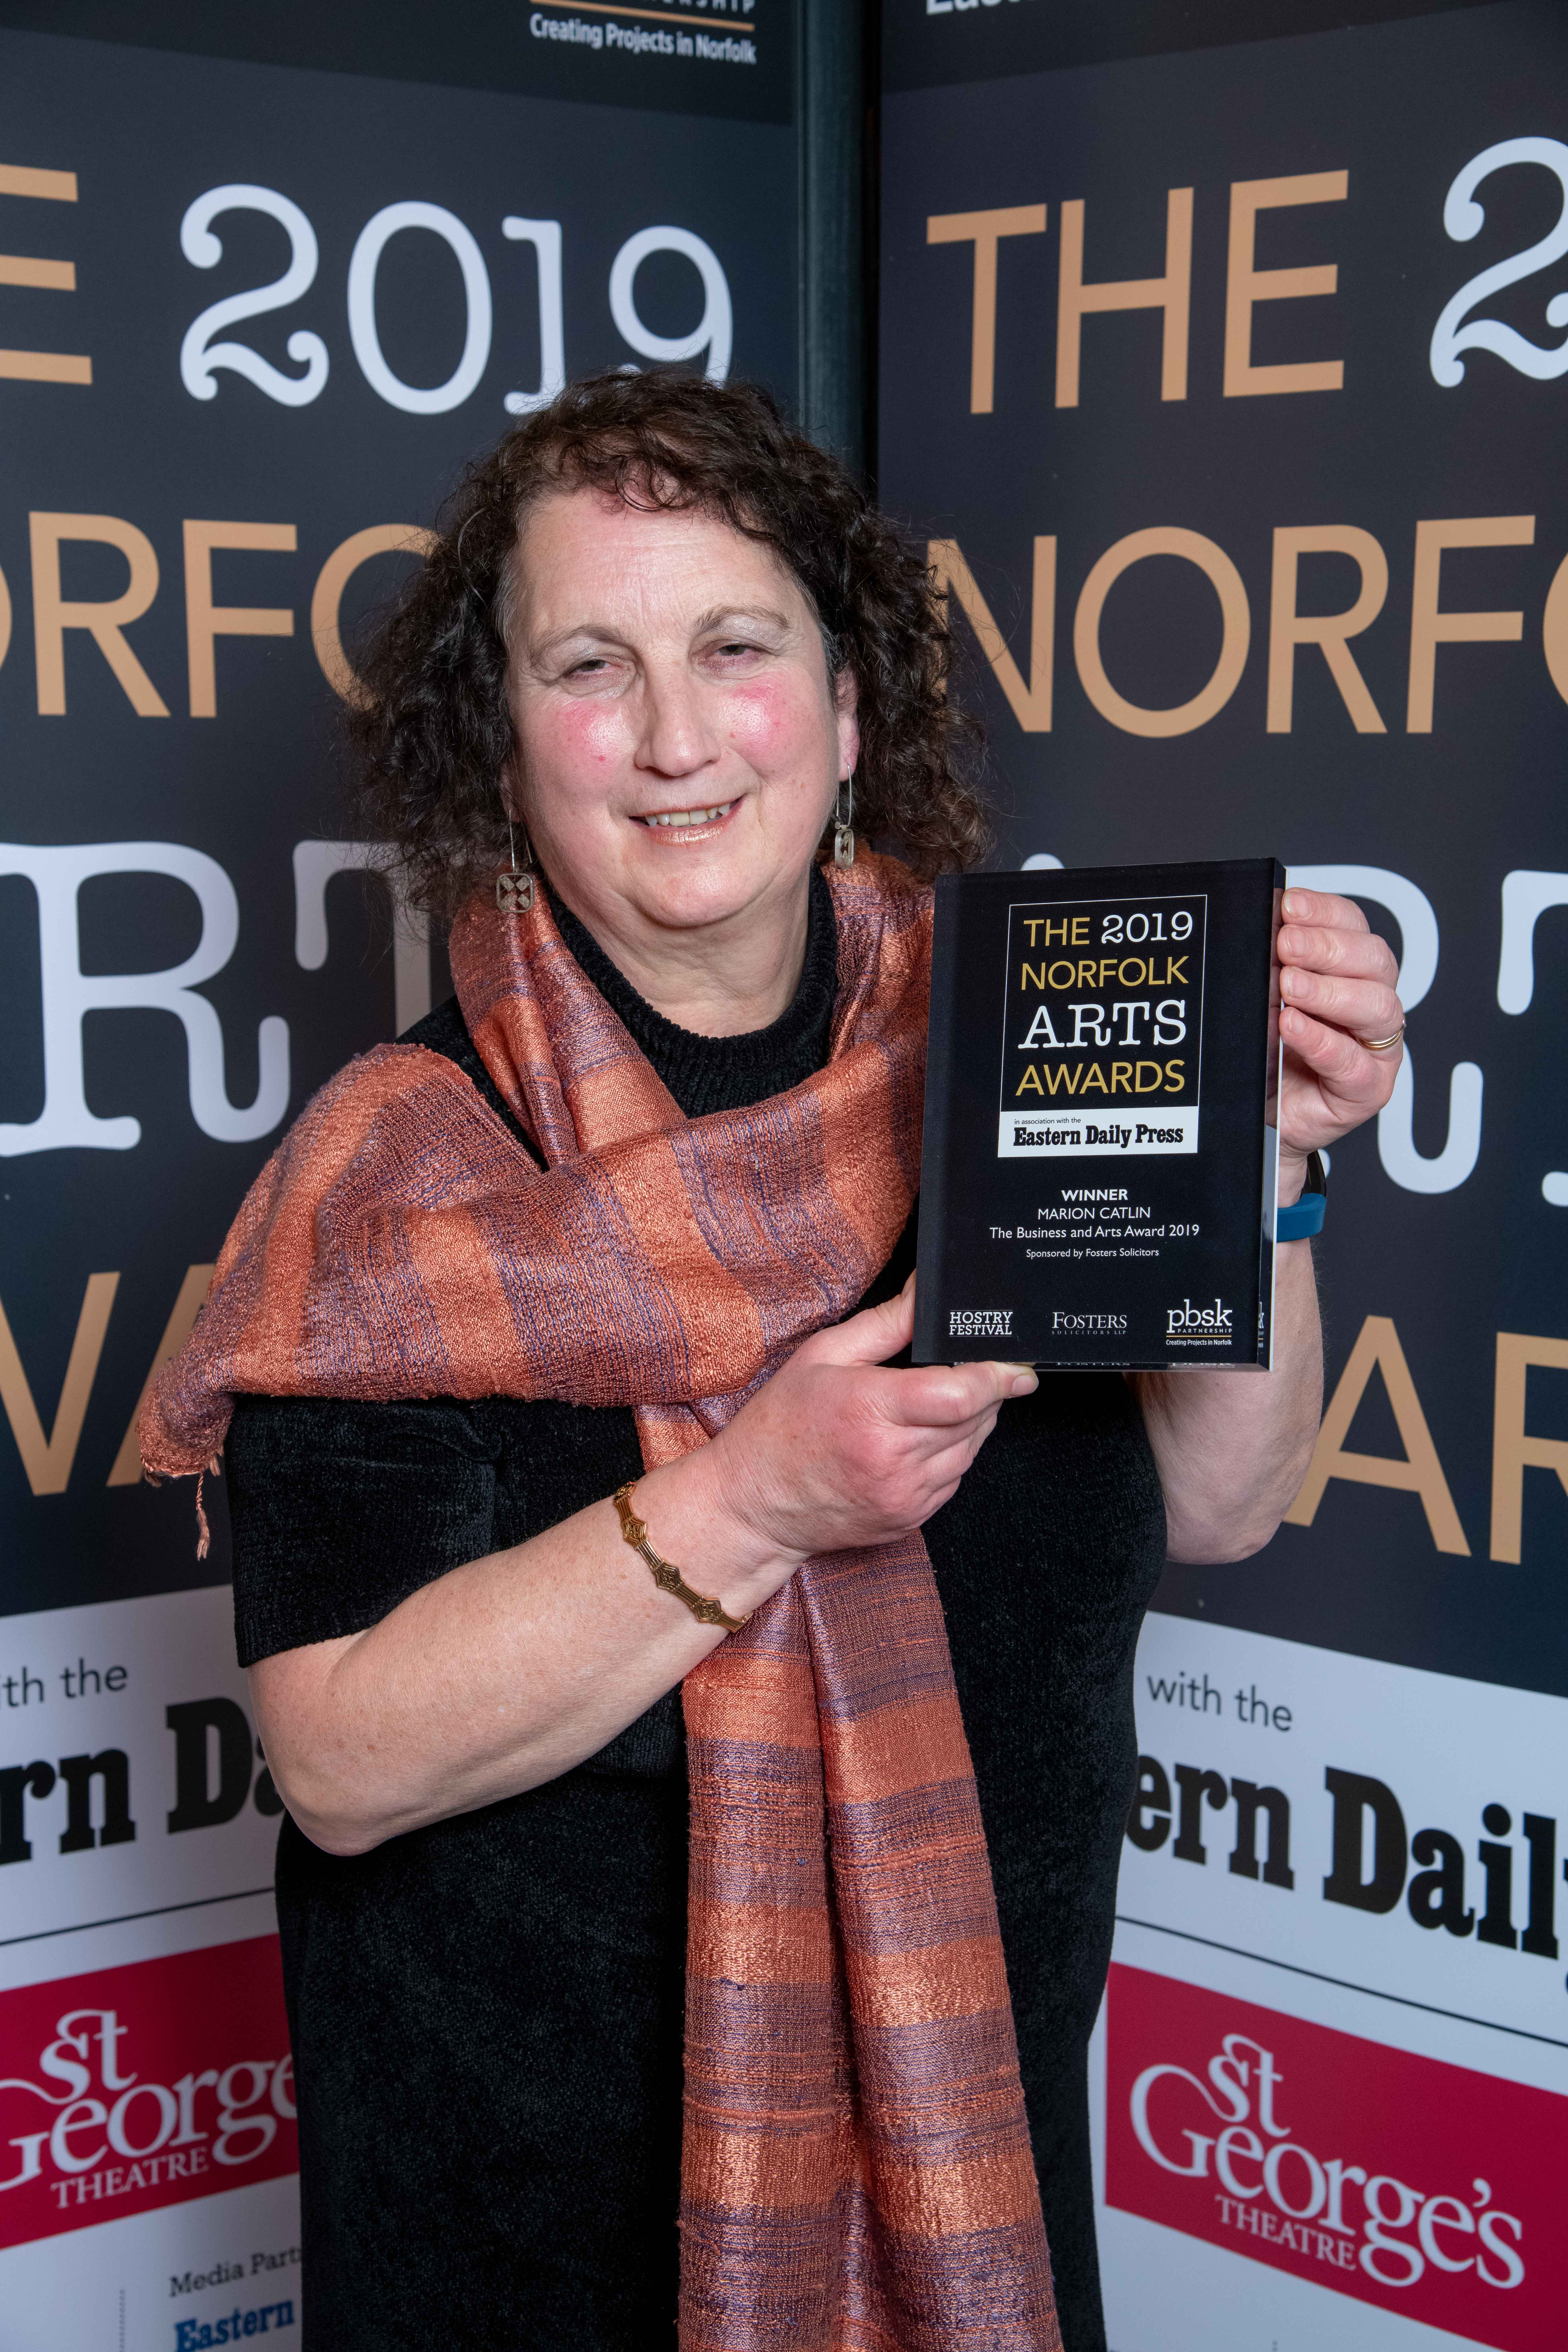 WINNER: Marion Catlin